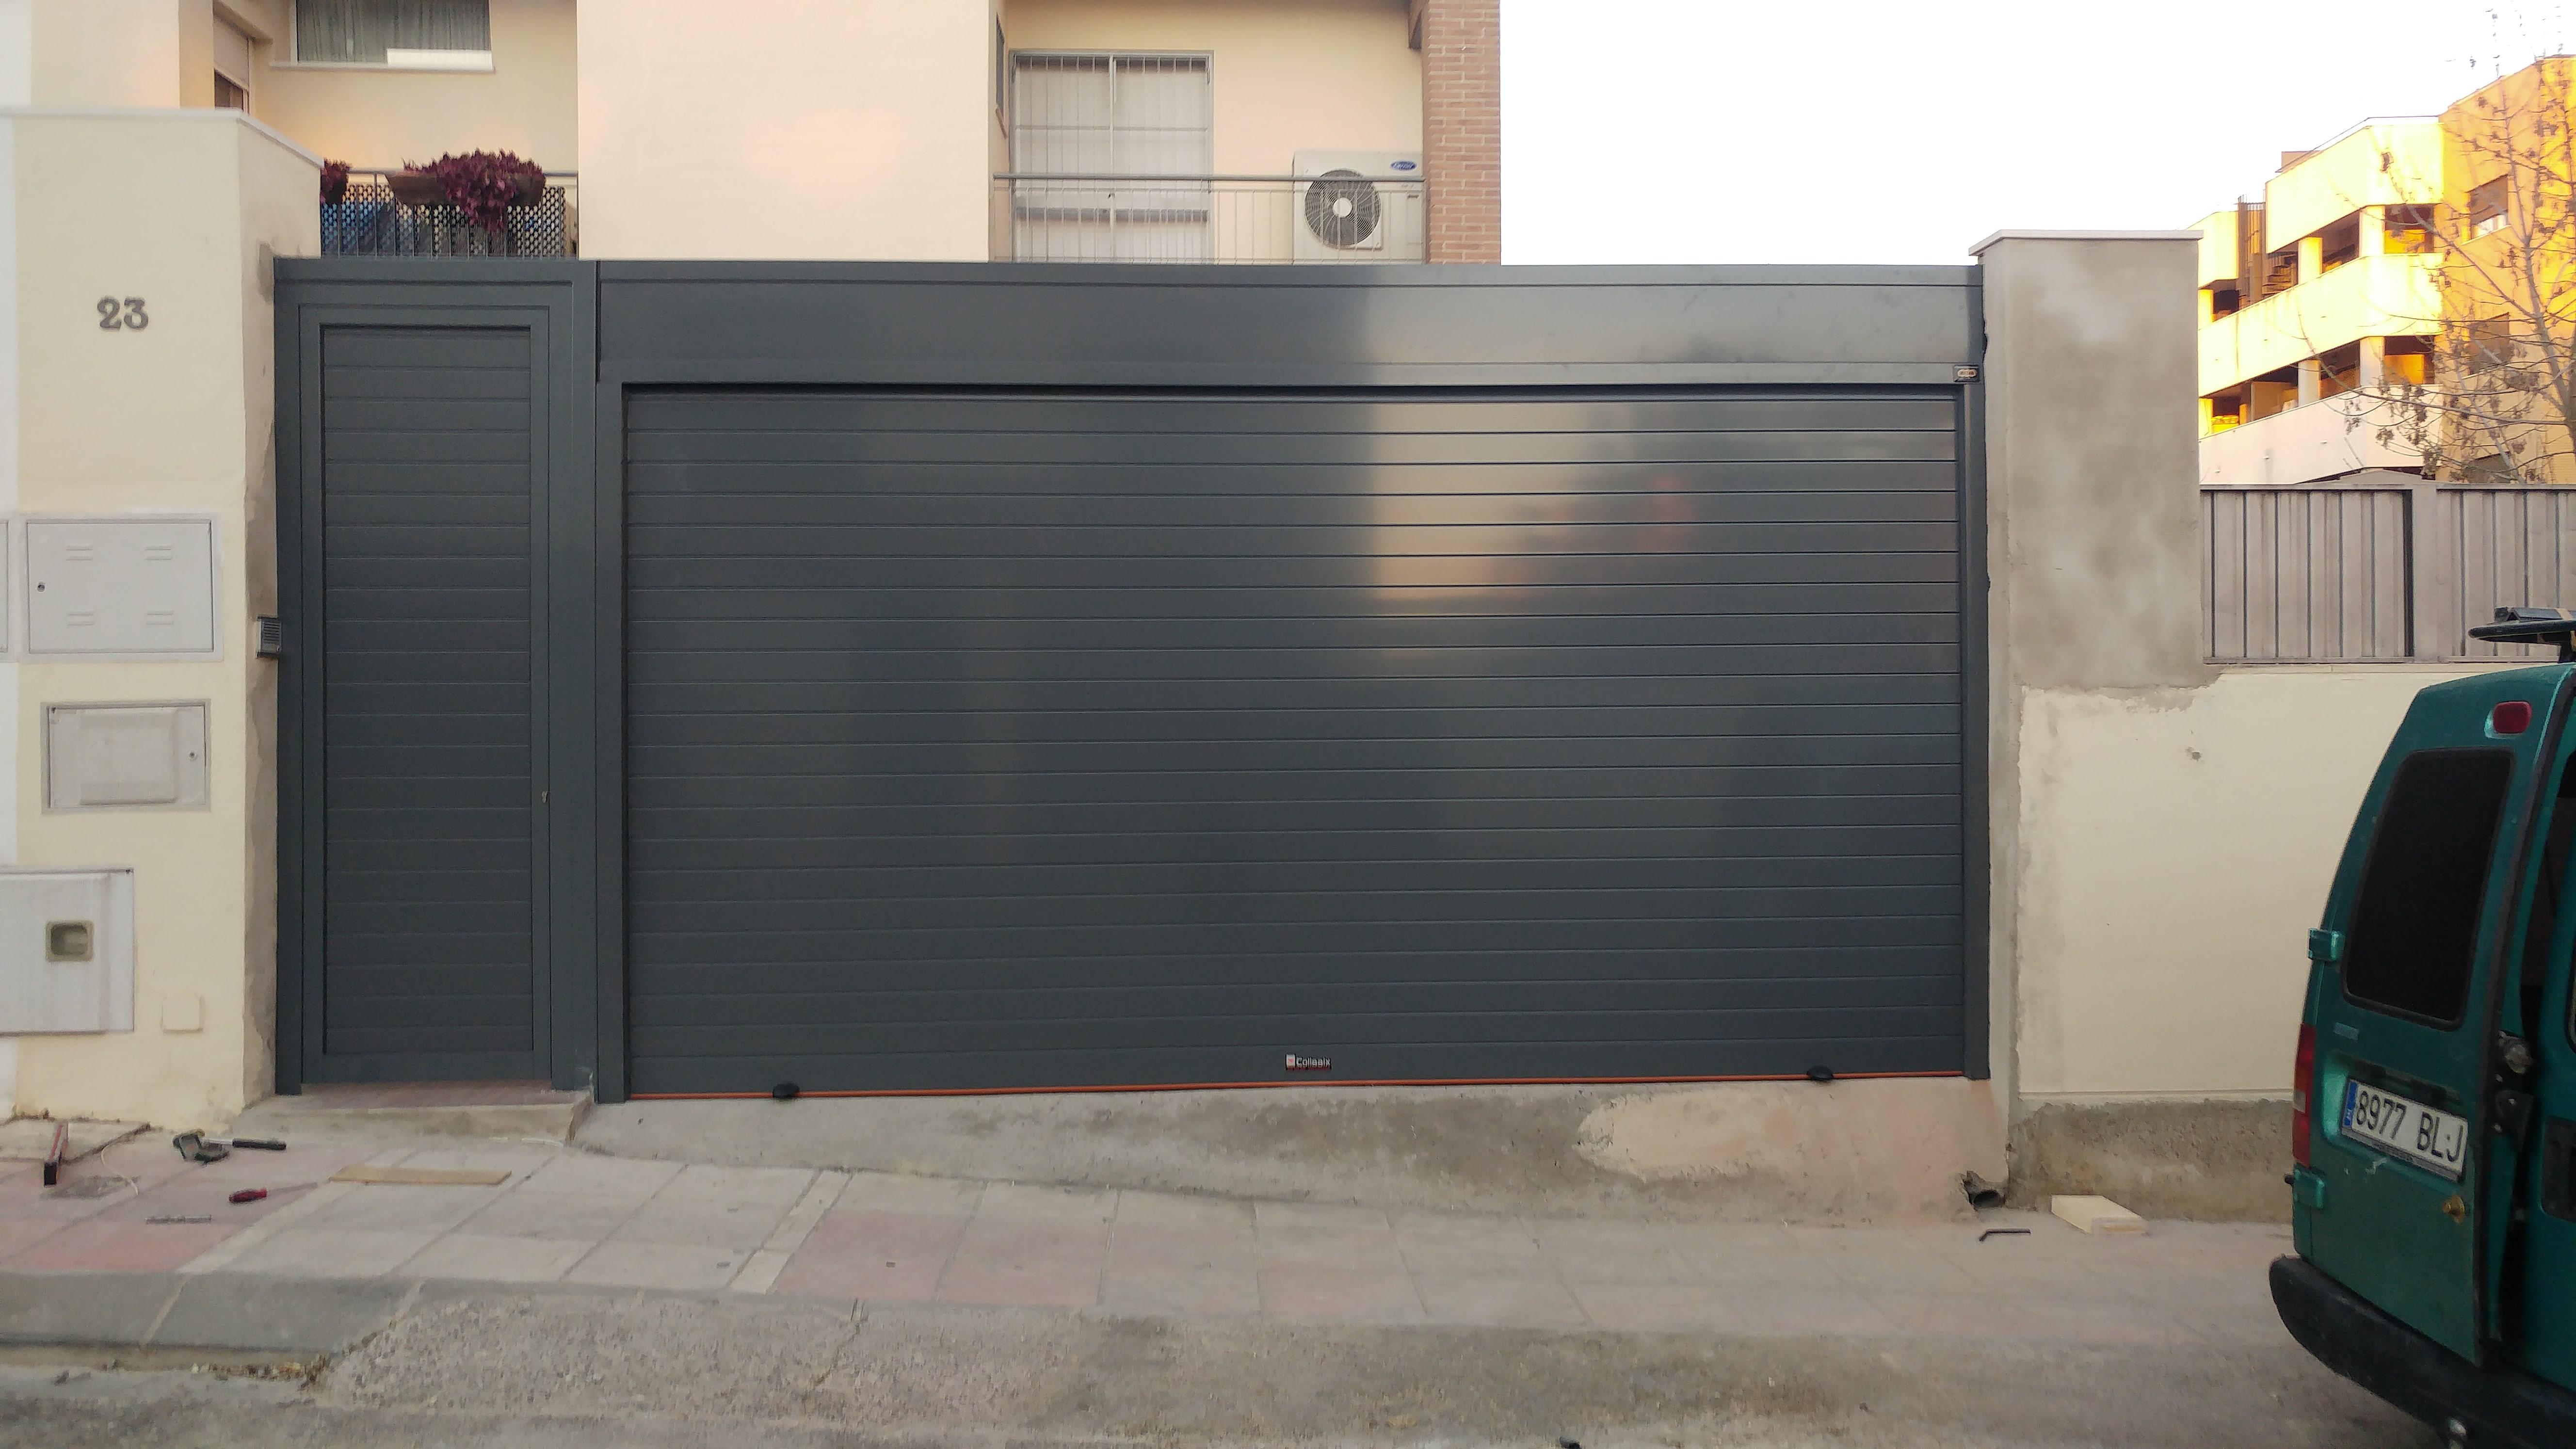 Cancelas autom ticas puertas automaticas mena - Automatismos para puertas de garaje ...